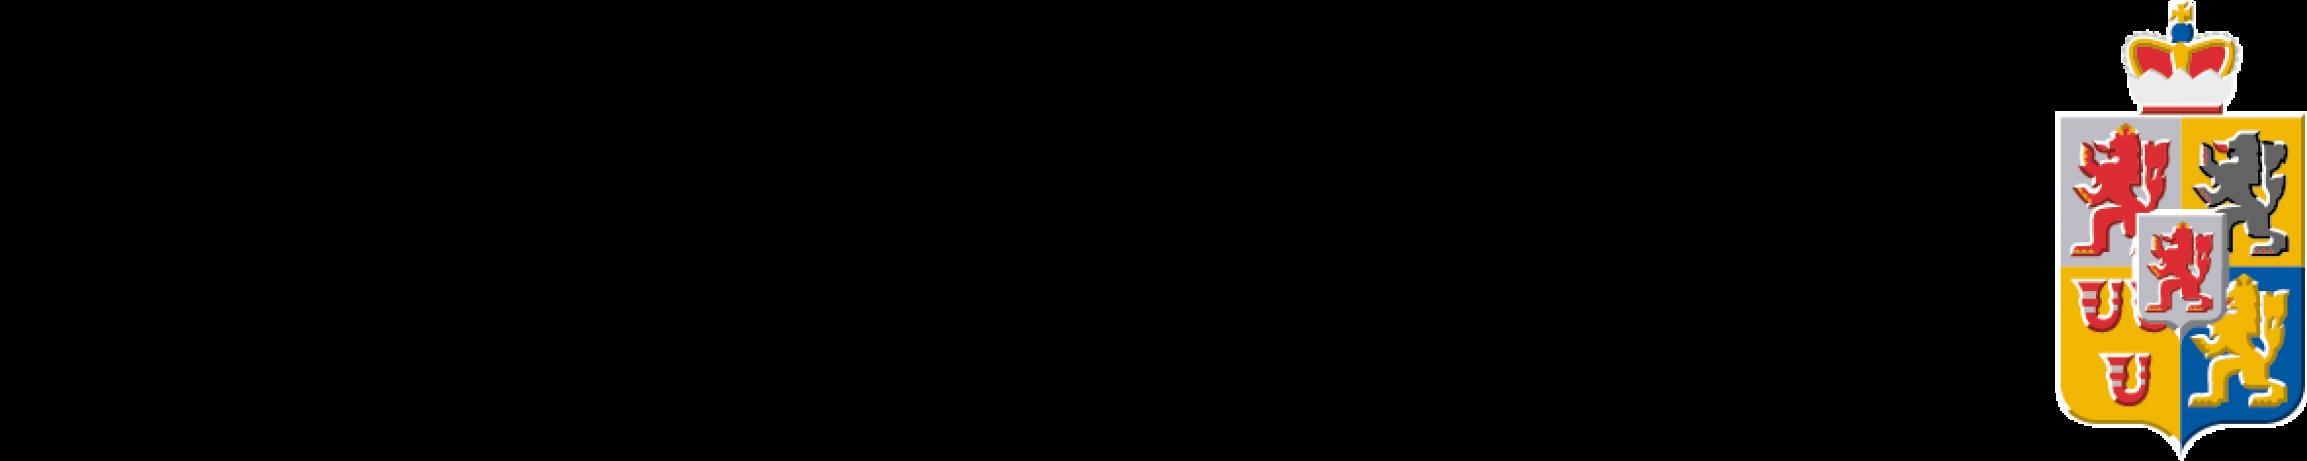 logoPL_fc_zwart.png